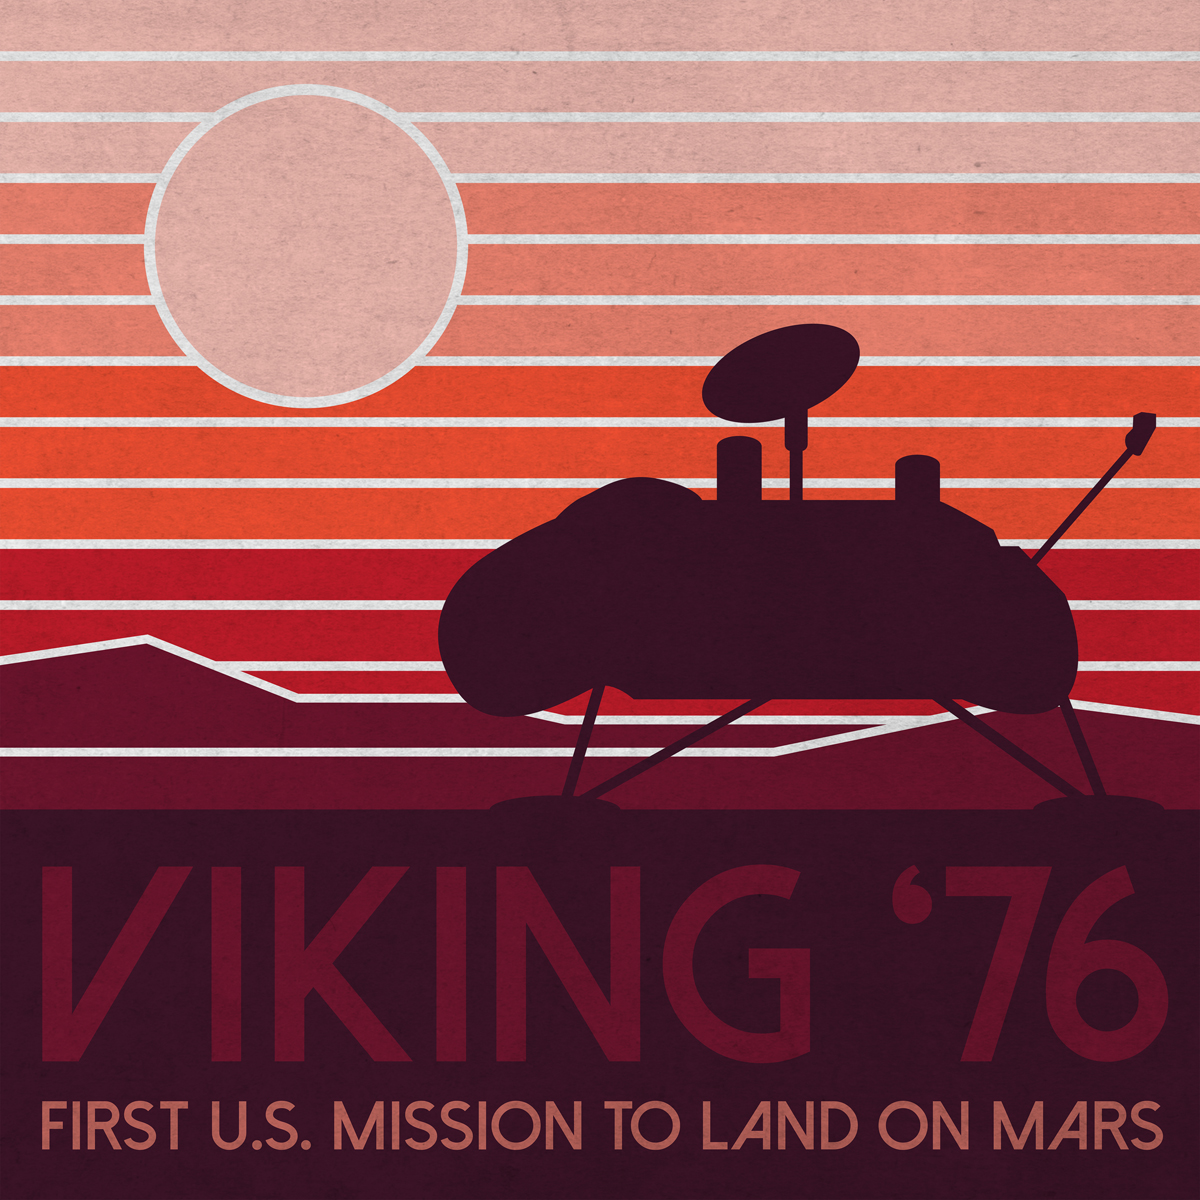 Viking_76_1200x1200